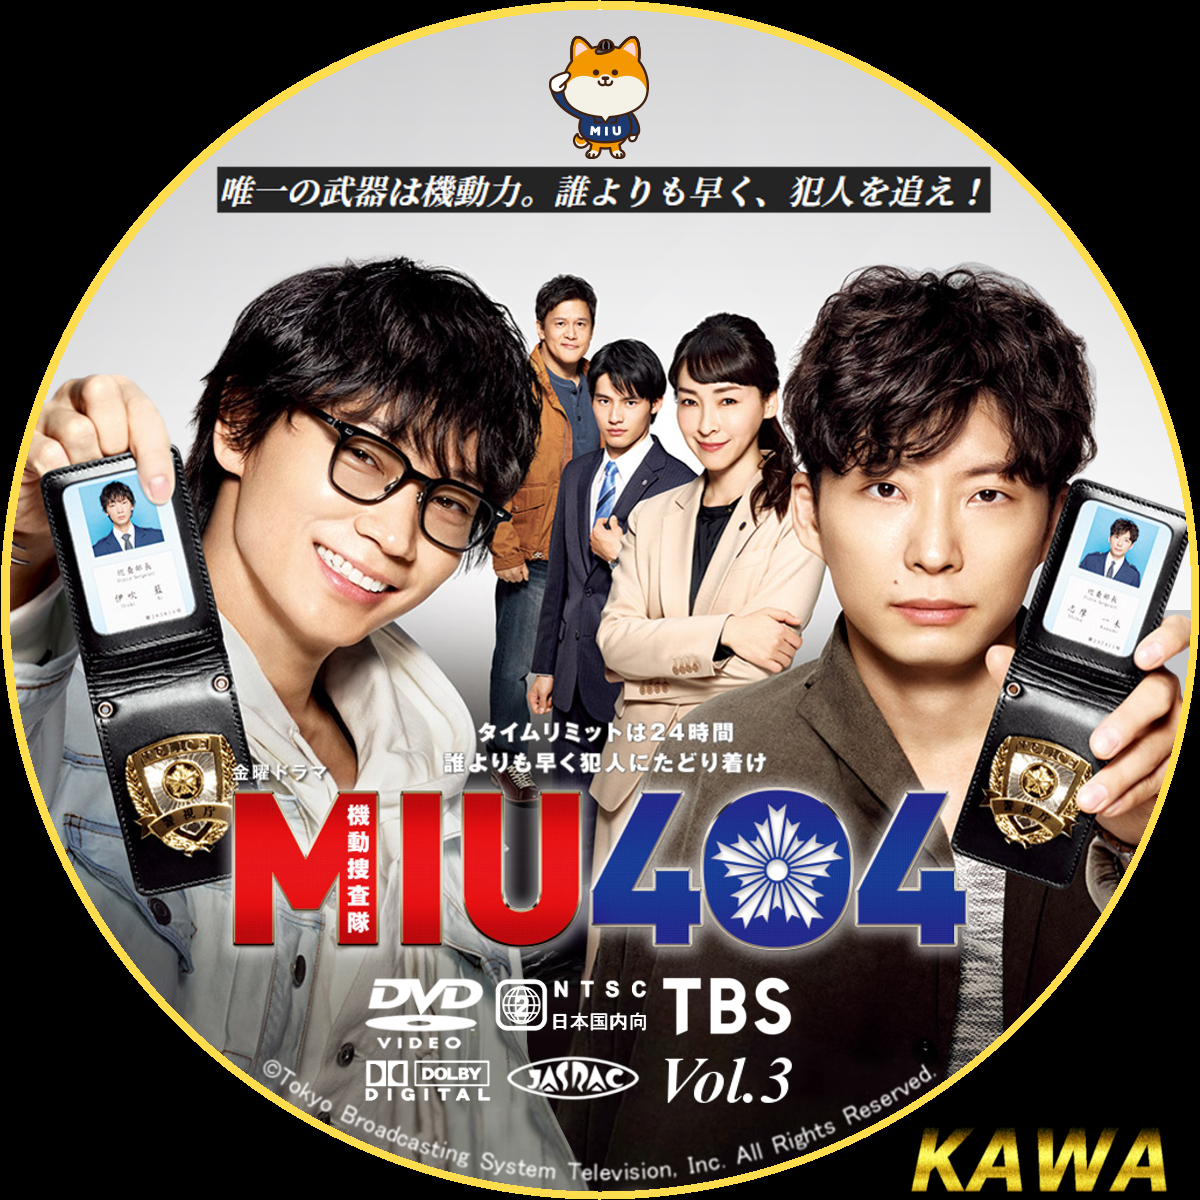 Miu 404 ドラマ 金曜ドラマ「MIU404」 TBSテレビ